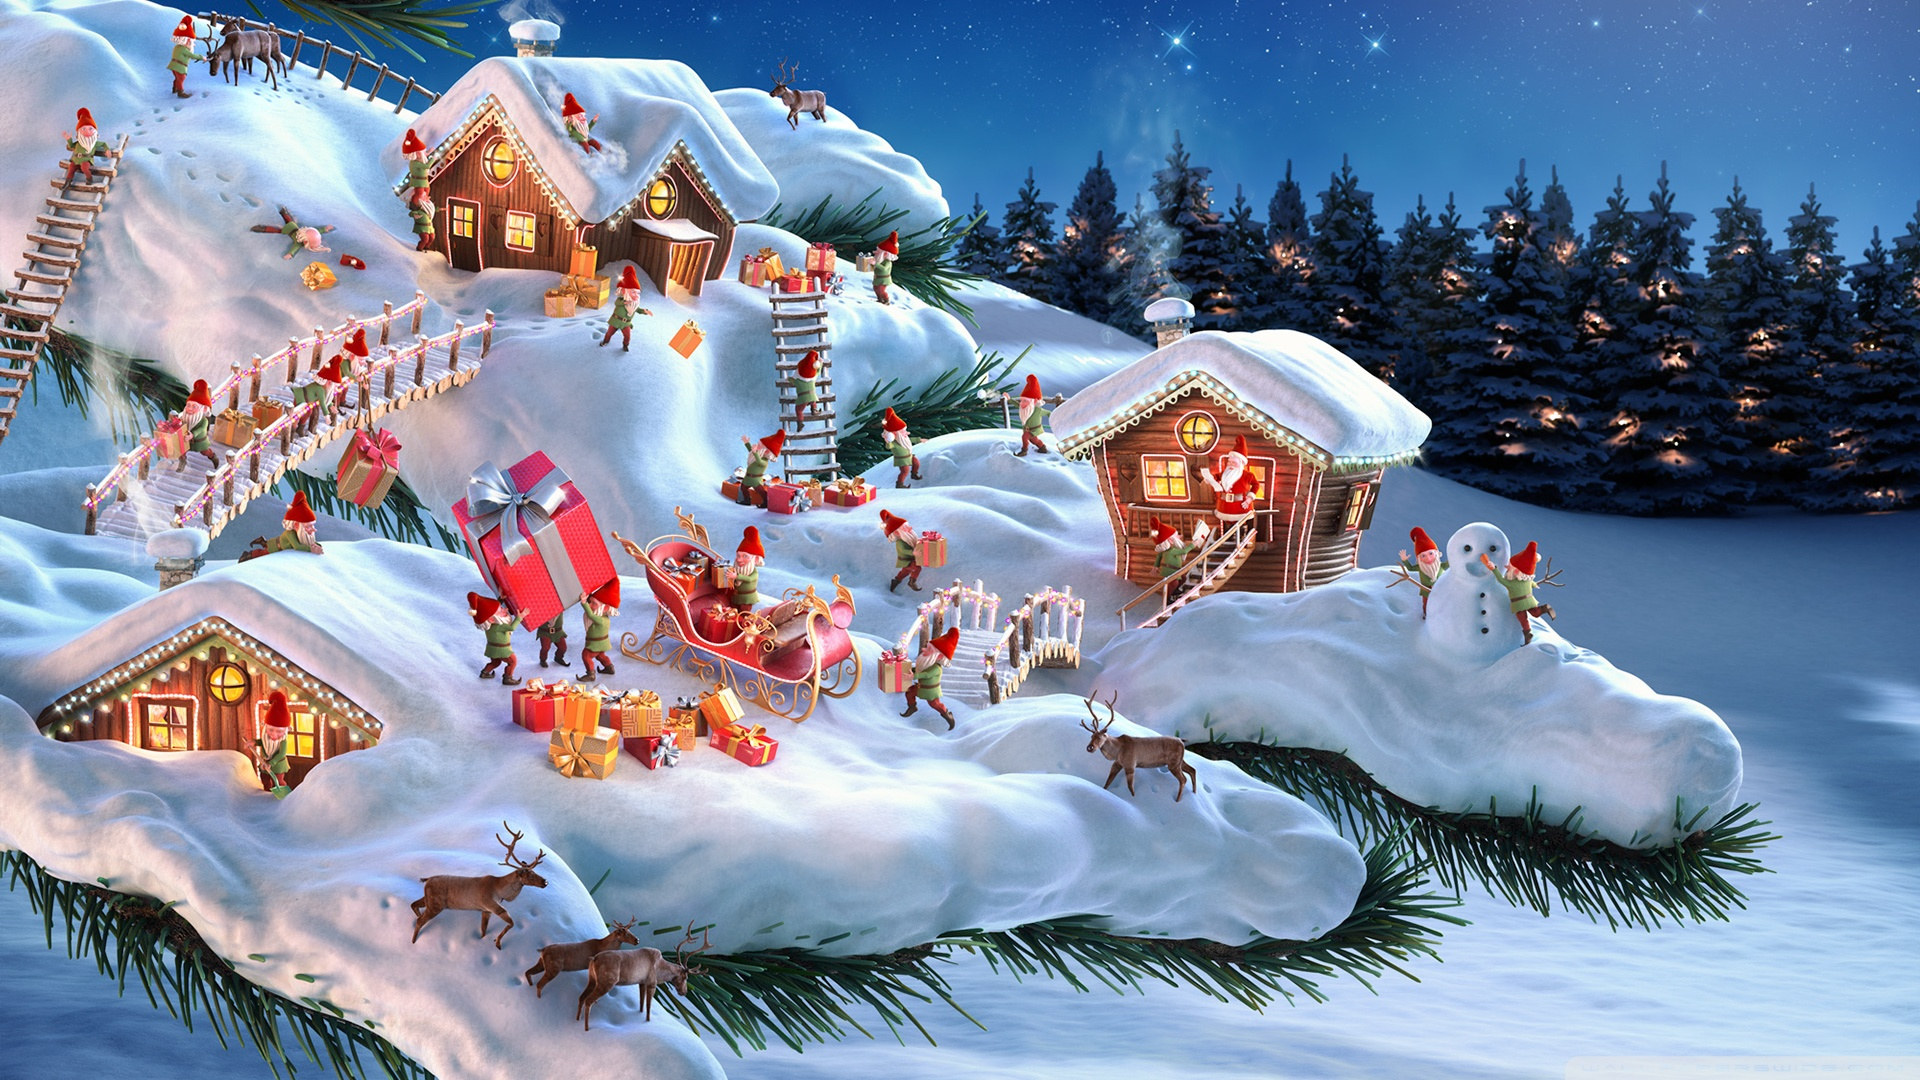 Santa and his Elves 4K HD Desktop Wallpaper for 4K Ultra HD TV 1920x1080